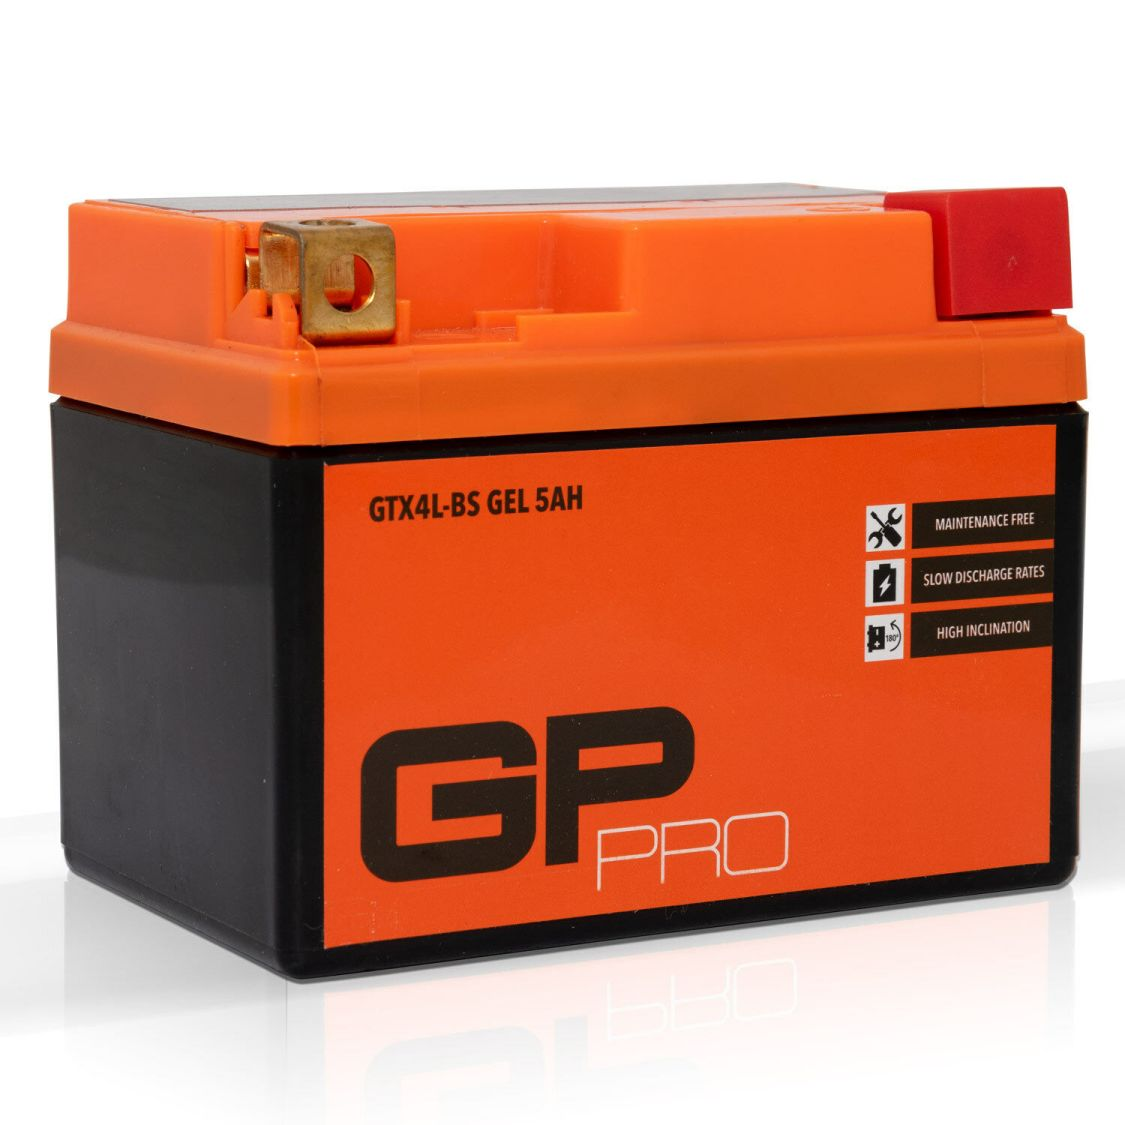 Batterie 12V 5AH GEL GP - PRO für Motorrad, Roller, Moped, Scooter